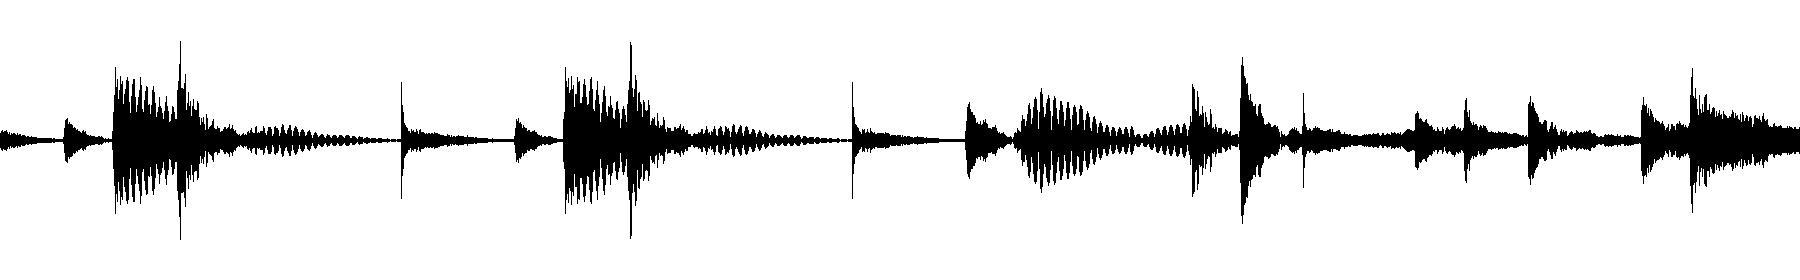 g abs05 067